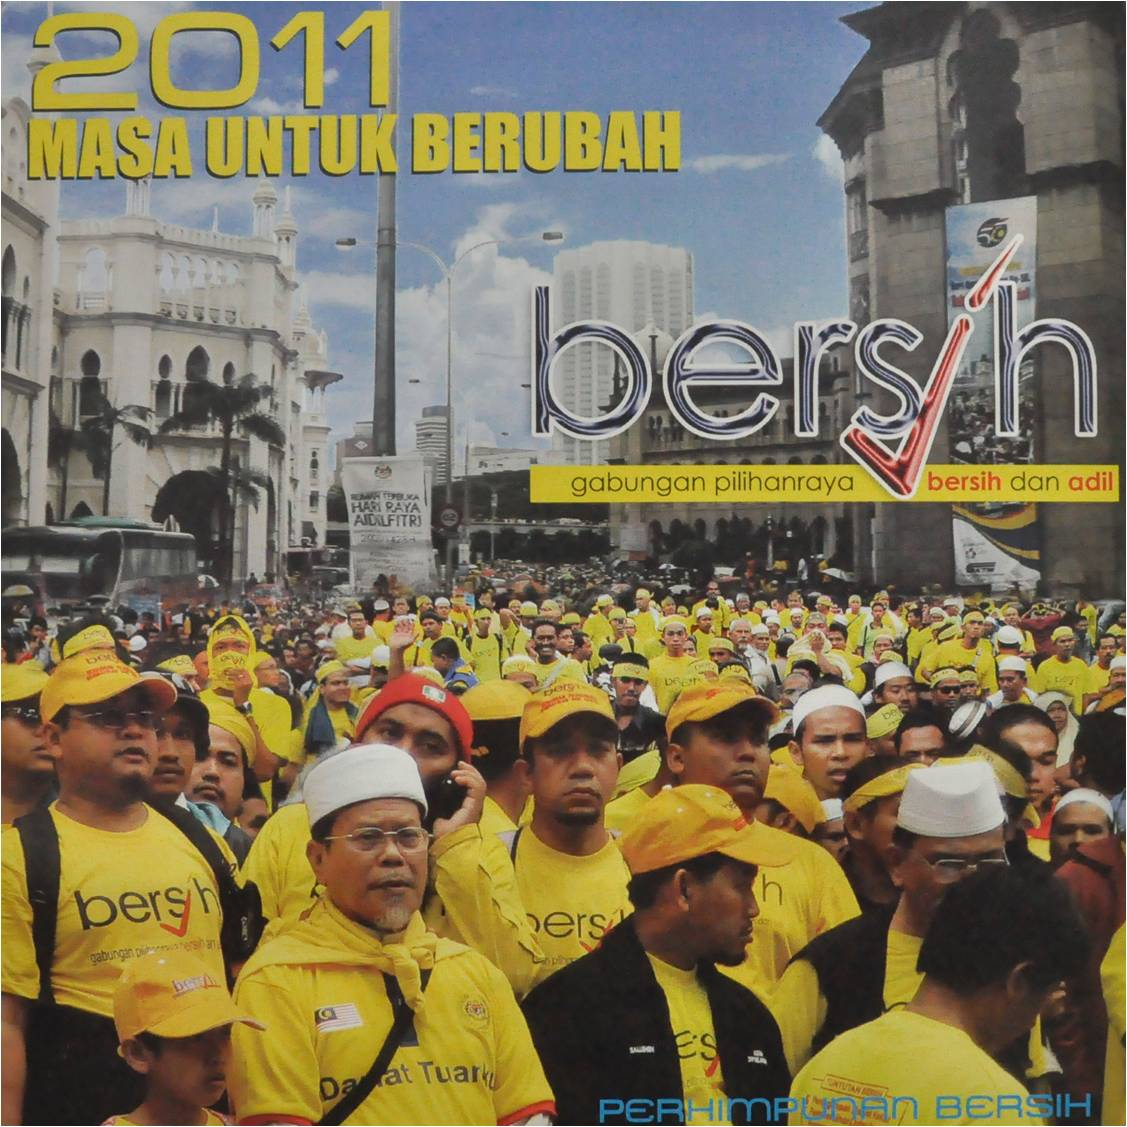 http://2.bp.blogspot.com/-BWNTVEXIkcA/Tgx2AiQ__WI/AAAAAAAACwk/ic9UtY02R-0/s1600/Bersih.jpg